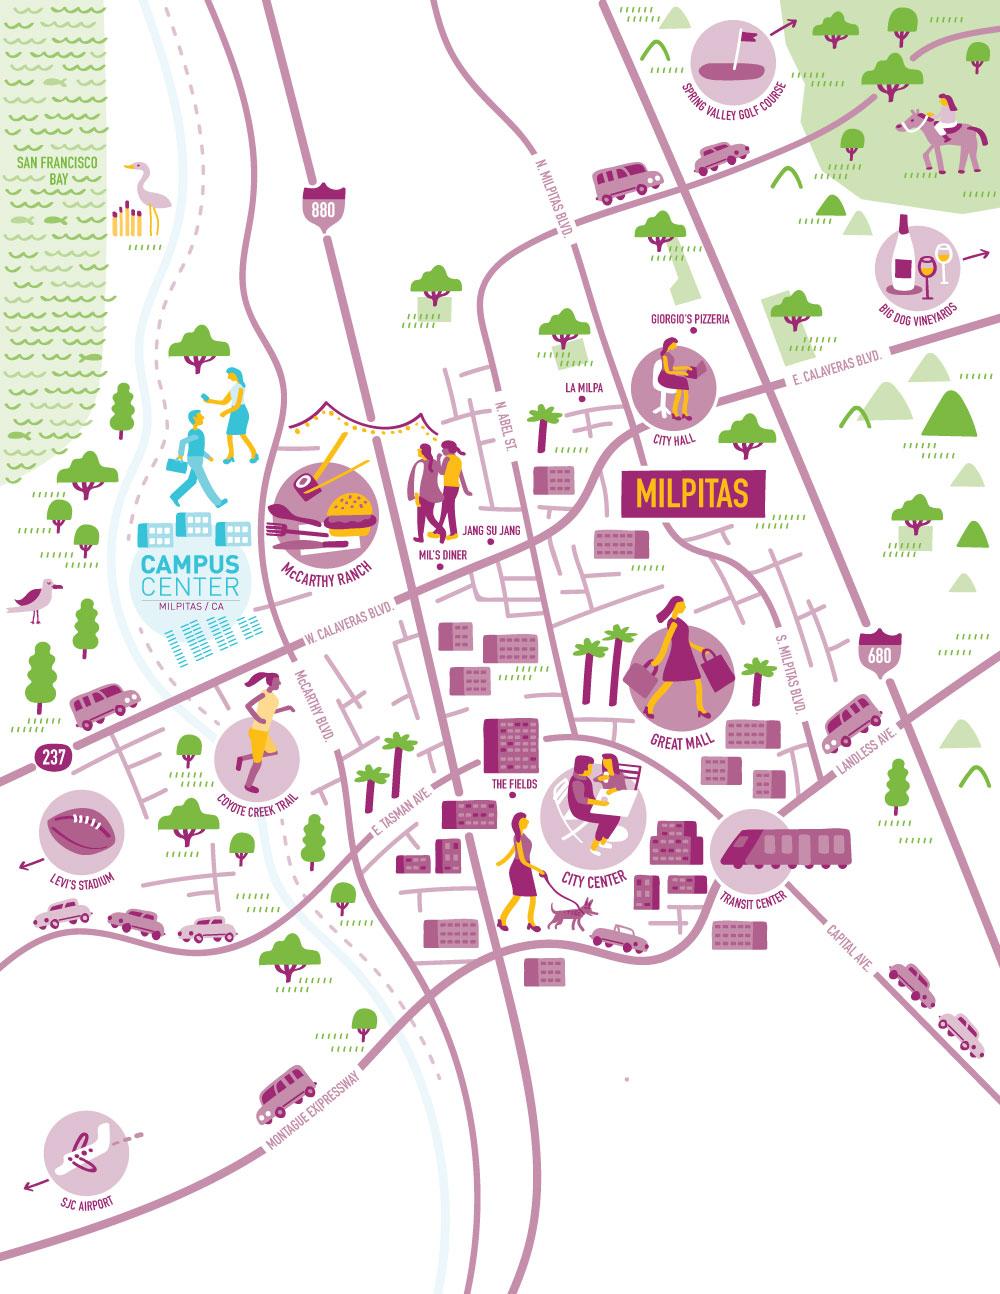 Campus-Center-map-by-Nate-Padavick.jpg